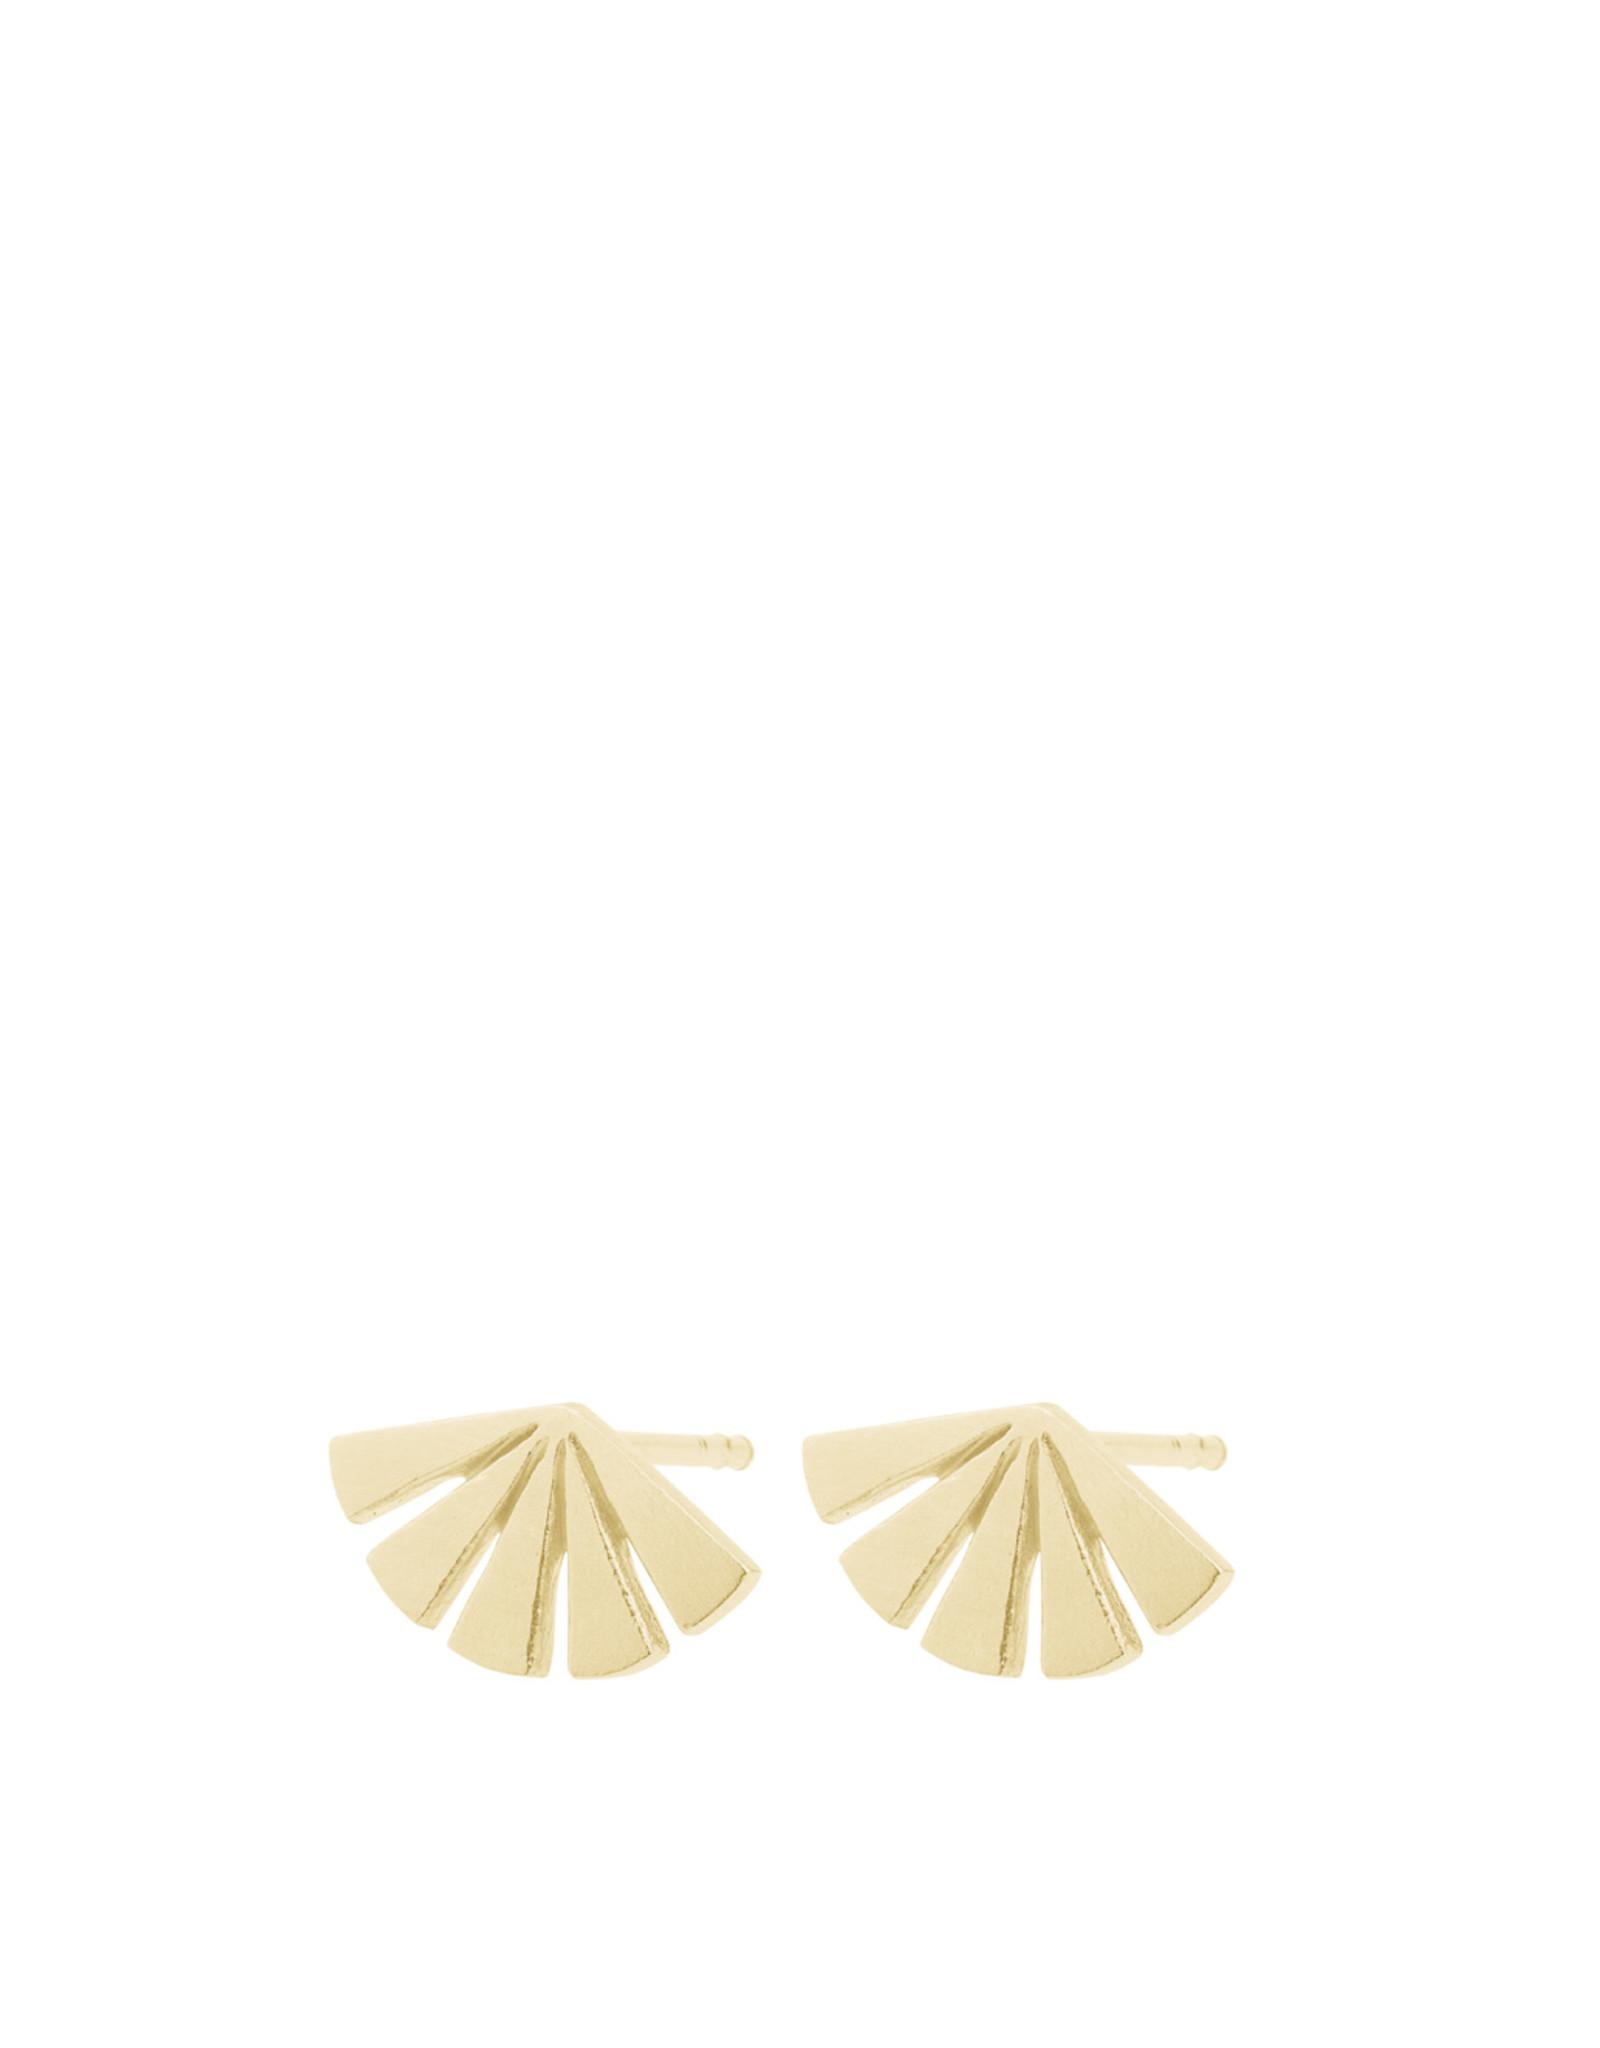 Pernille Corydon Dawn Earstick 12mm